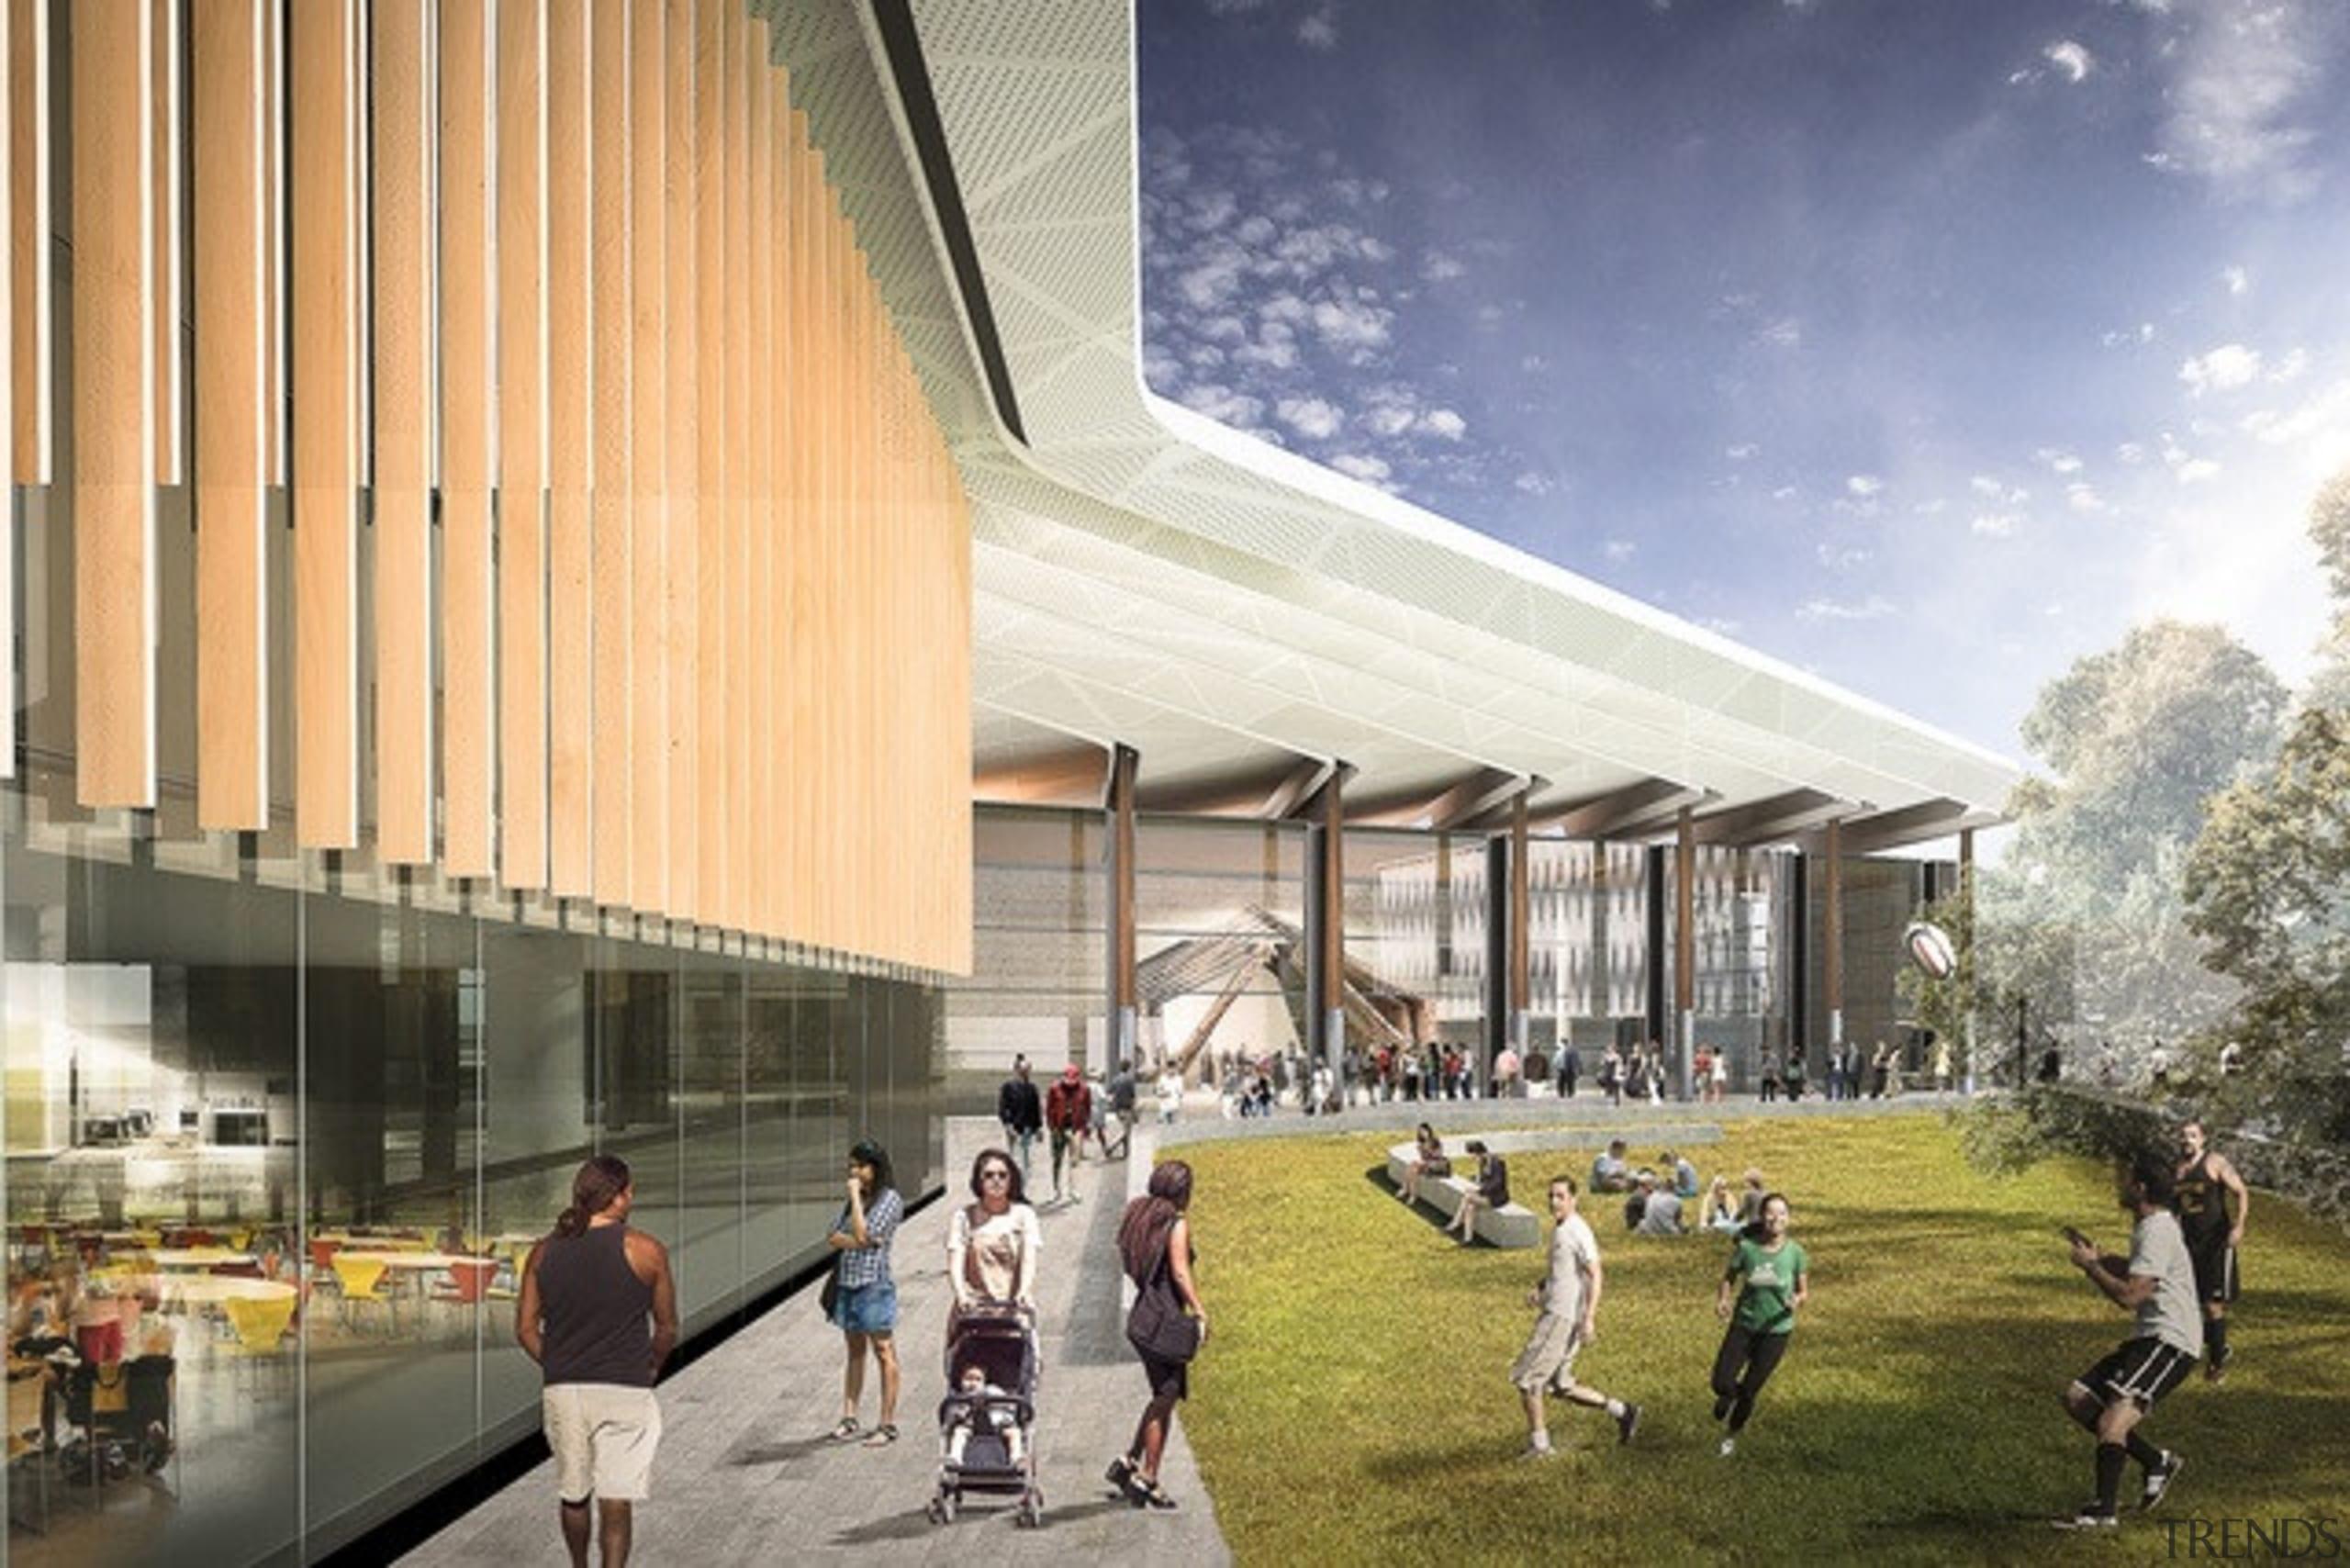 University of Waikato Marae and Multi-Purpose Facility (Hamilton) architecture, building, campus, convention center, corporate headquarters, daytime, metropolitan area, mixed use, structure, urban design